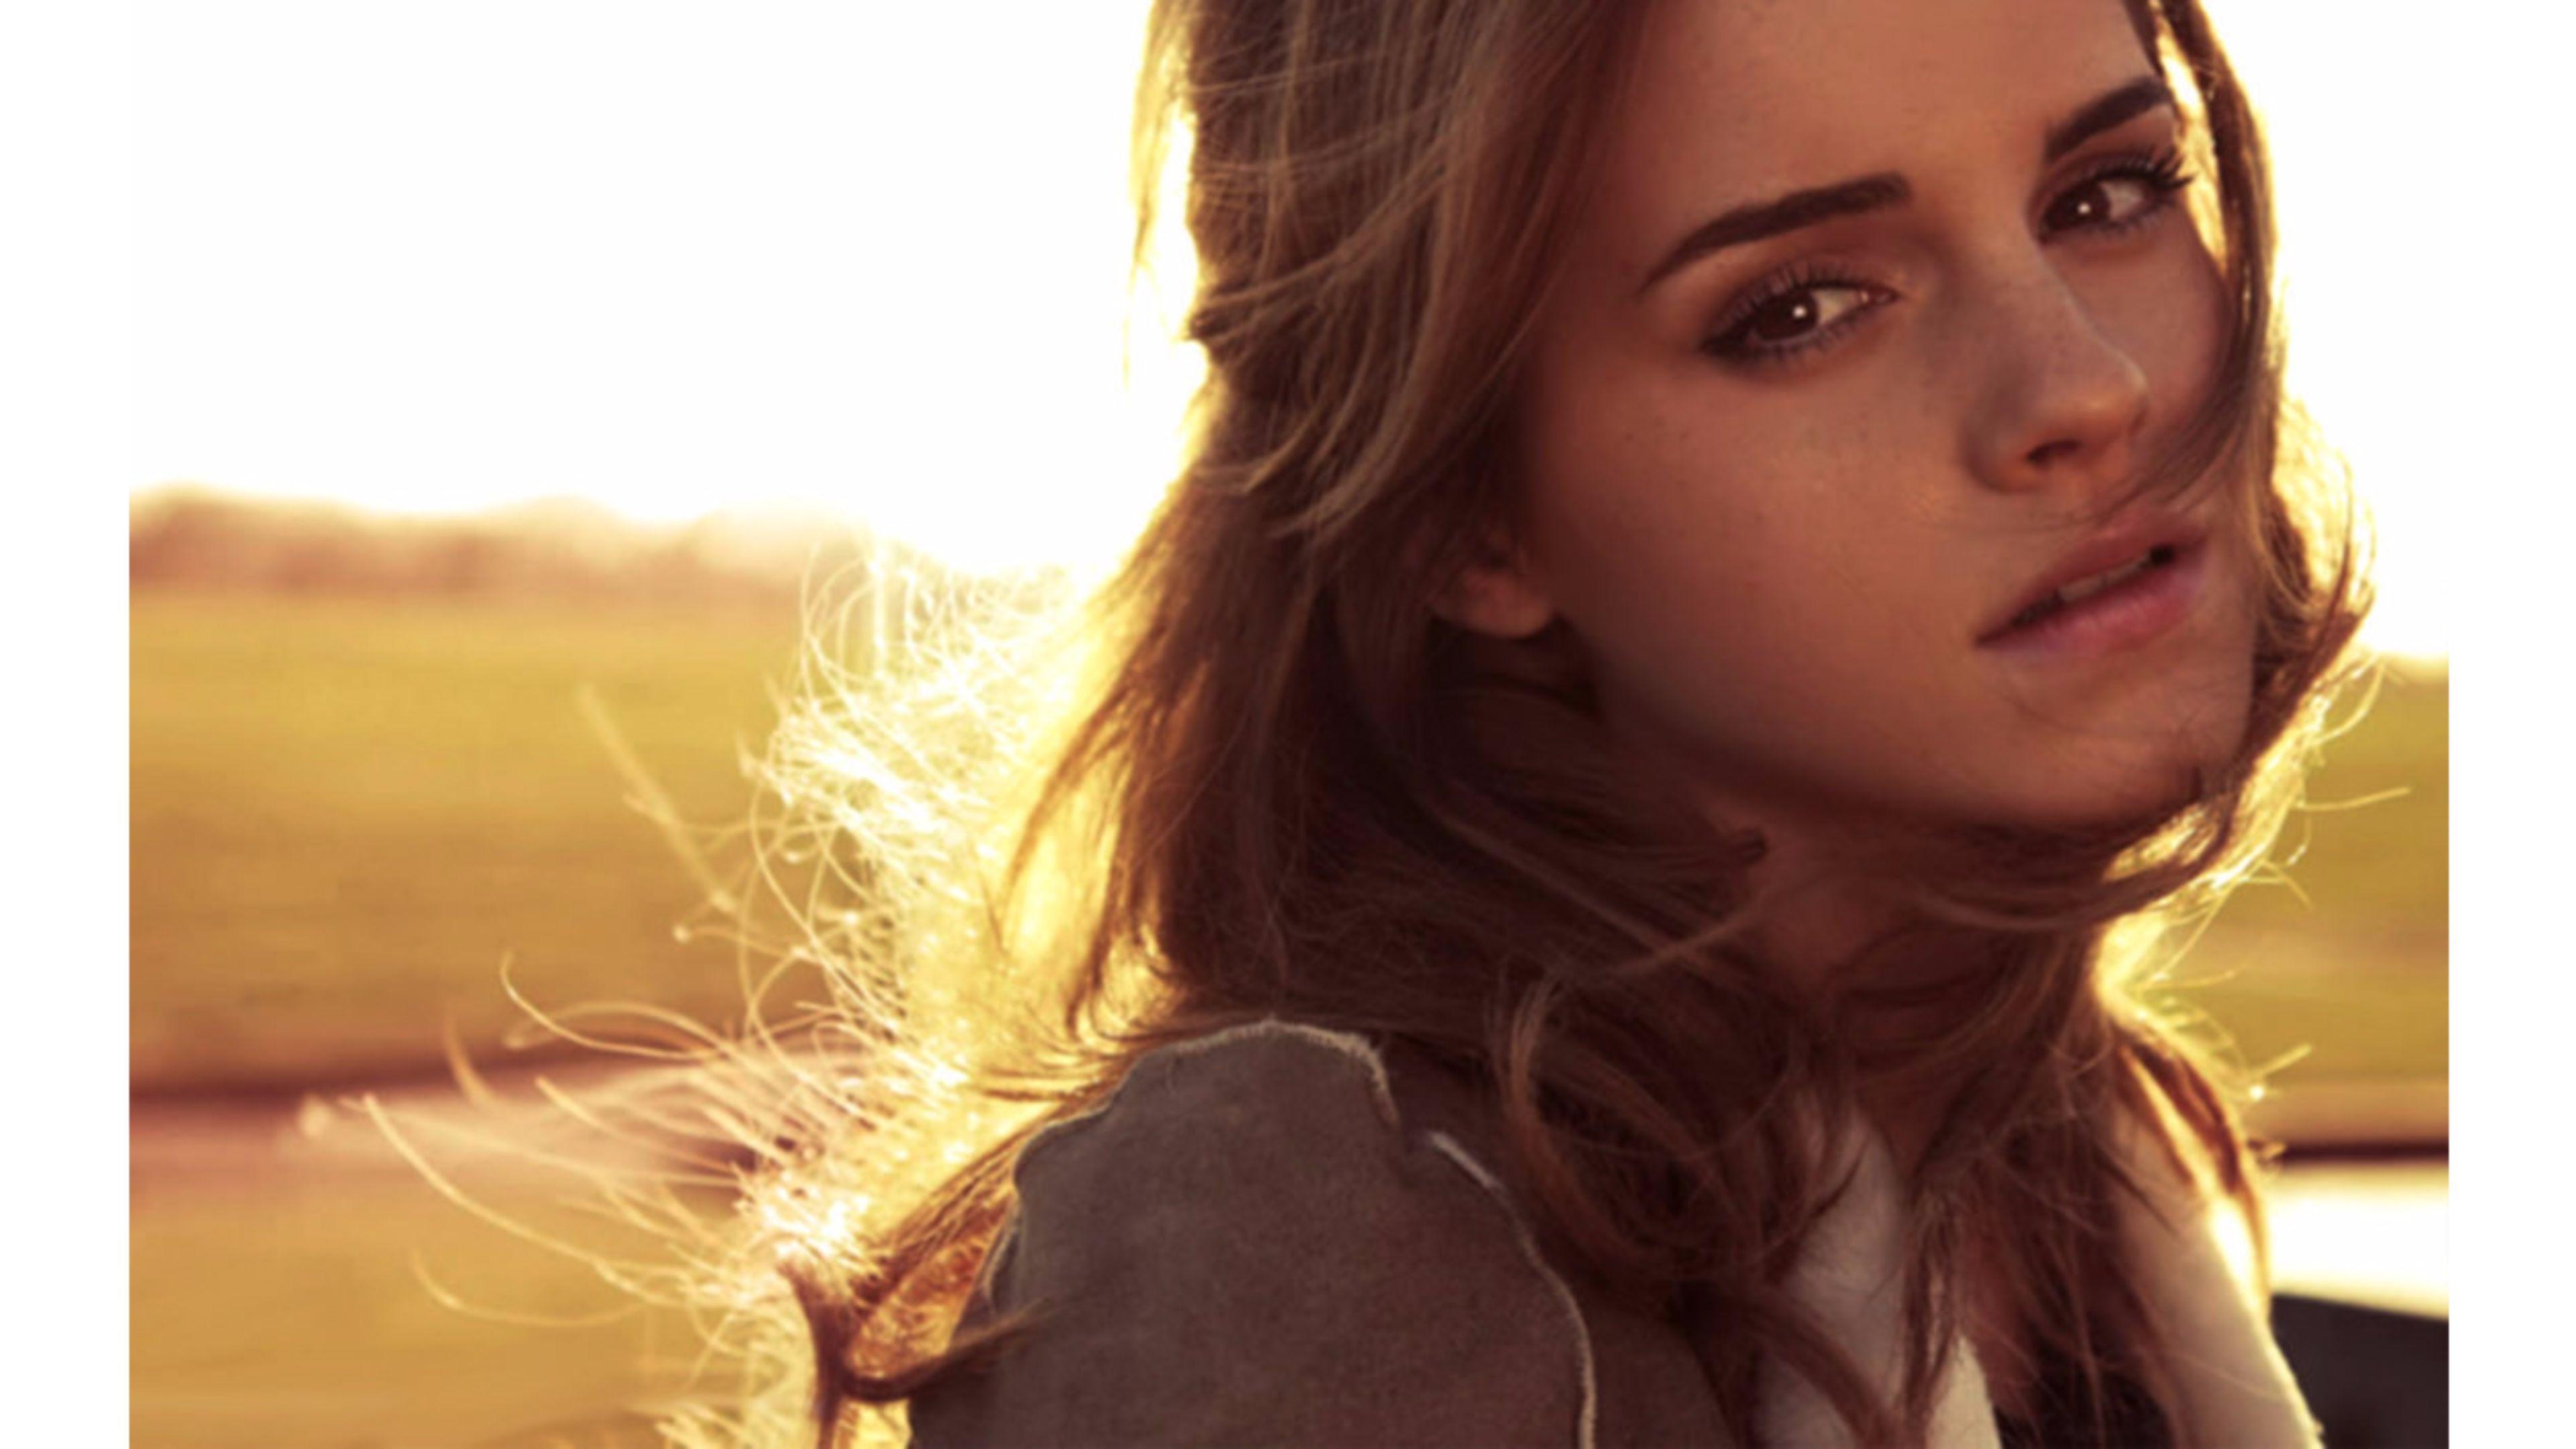 Emma Watson Wallpapers - Top Free Emma Watson Backgrounds ...